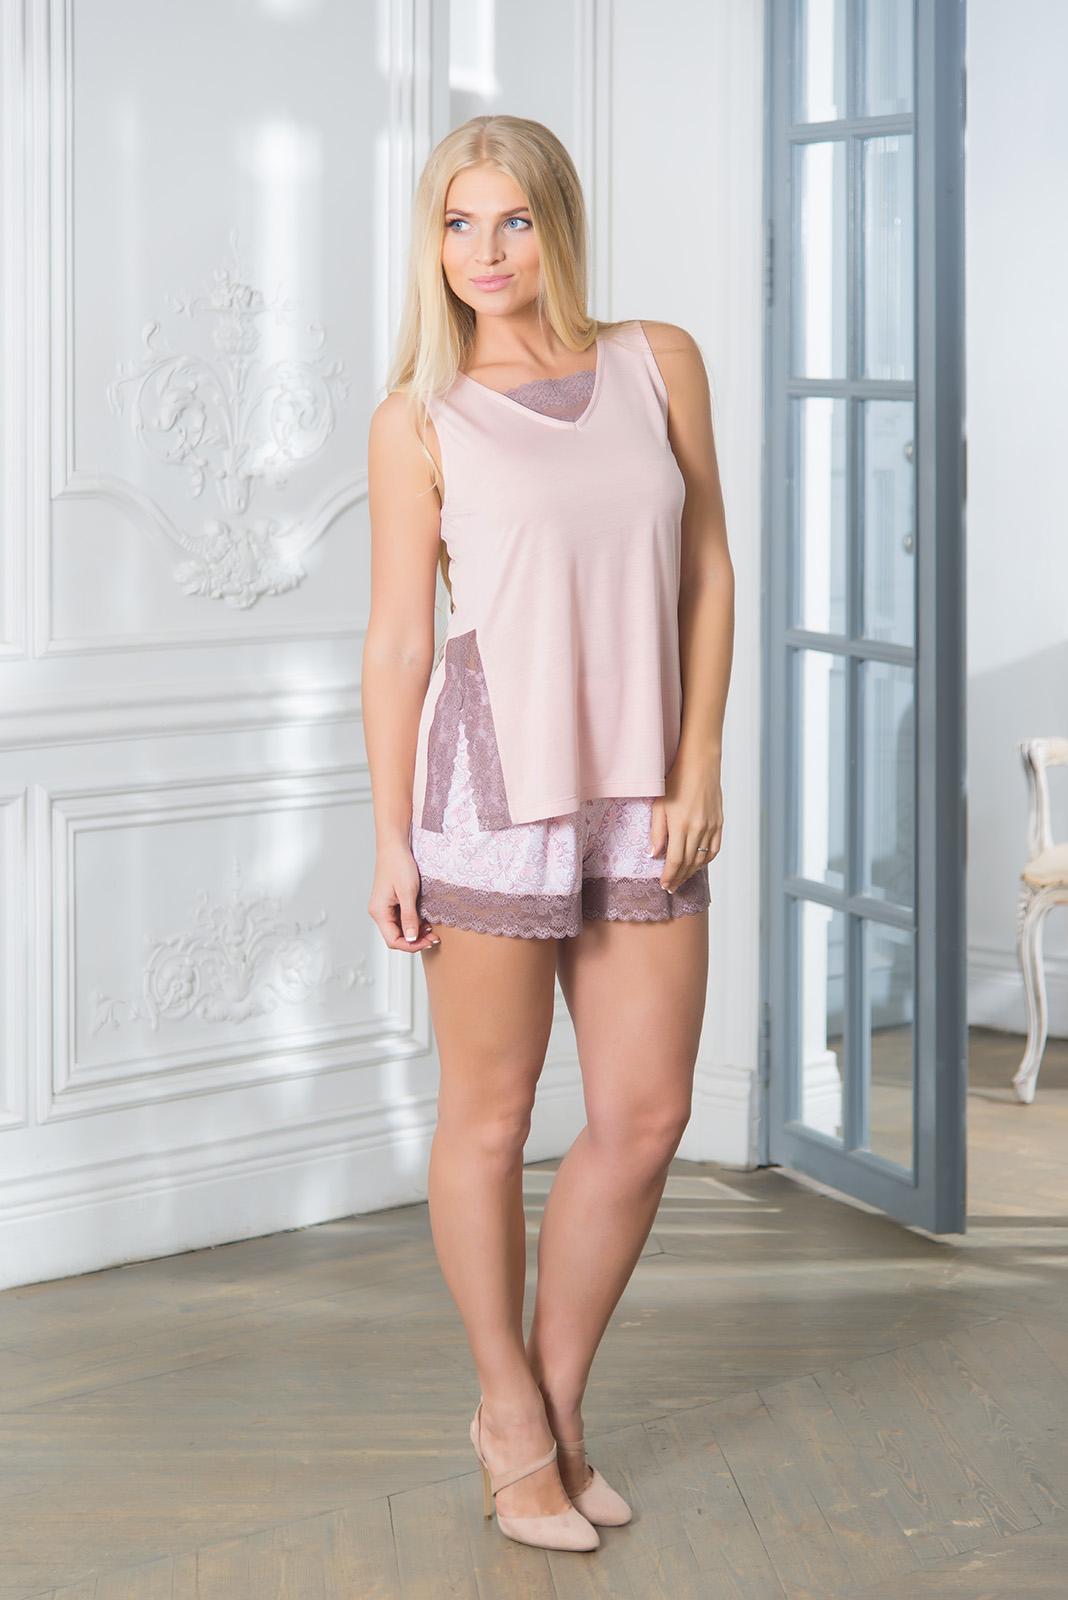 Пижамы Mia Cara Пижама Paulina Цвет: Розовый (S) пижамы mia cara пижама paisley цвет розовый m l